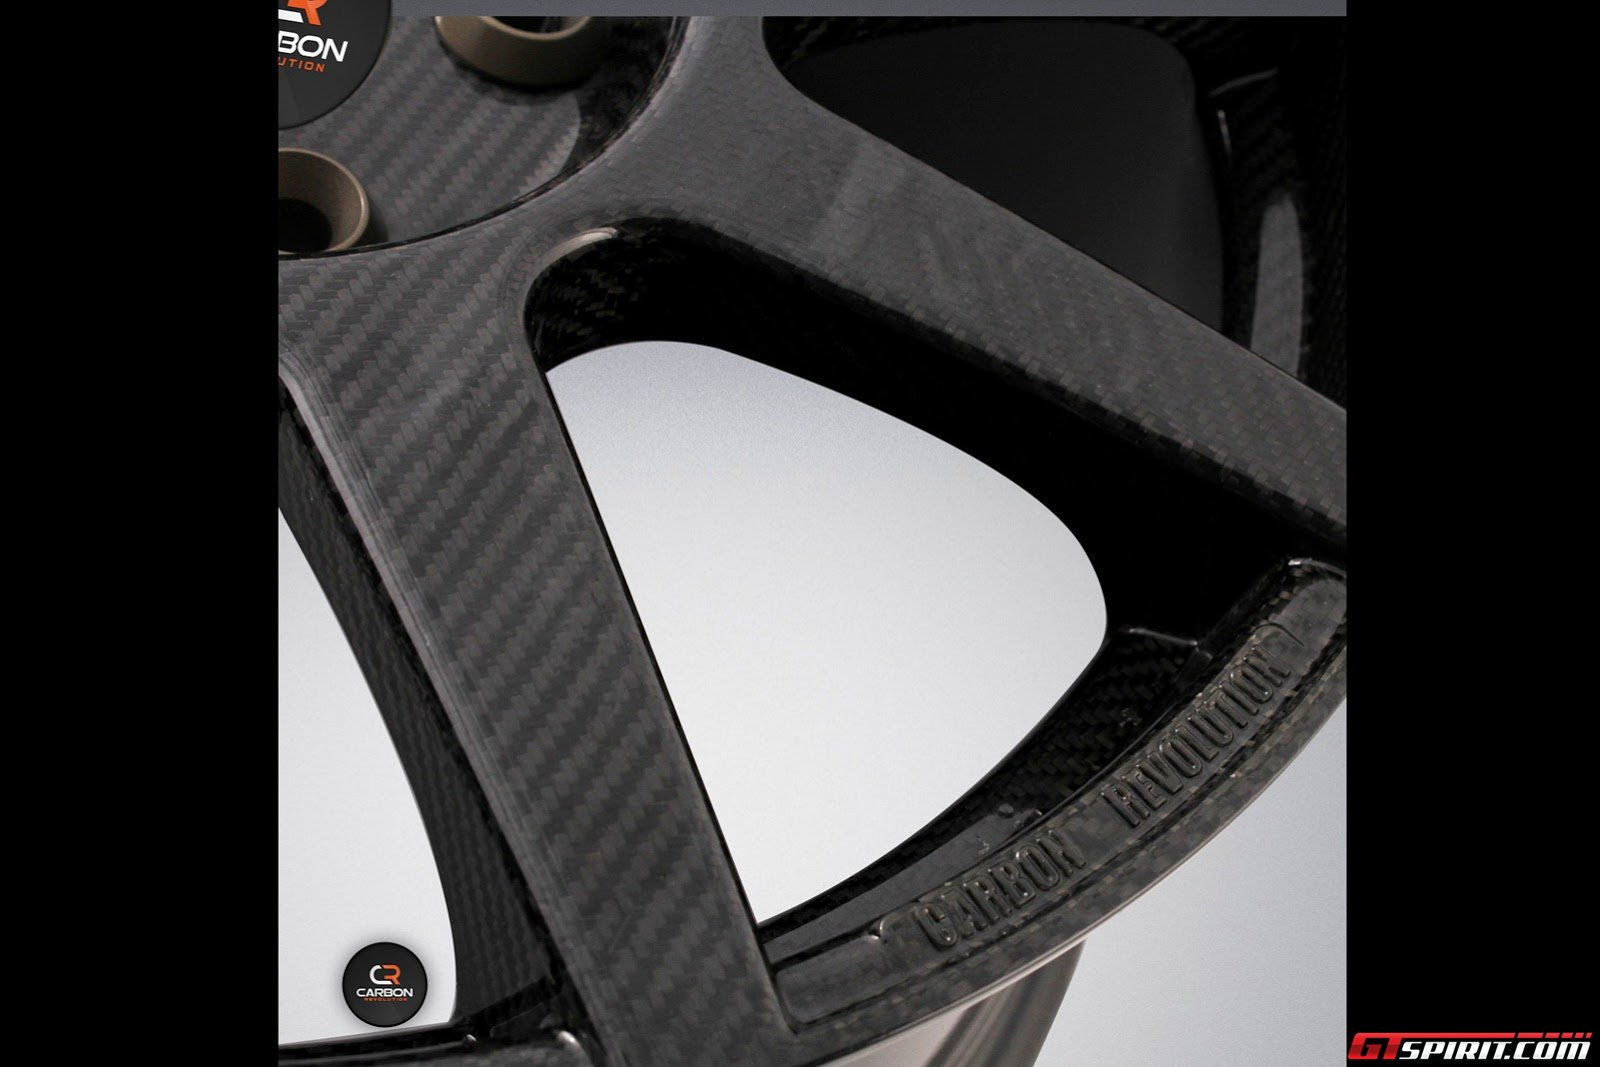 Carbon Revolution CR9 - First One-piece Carbon Fiber Rim Photo 7